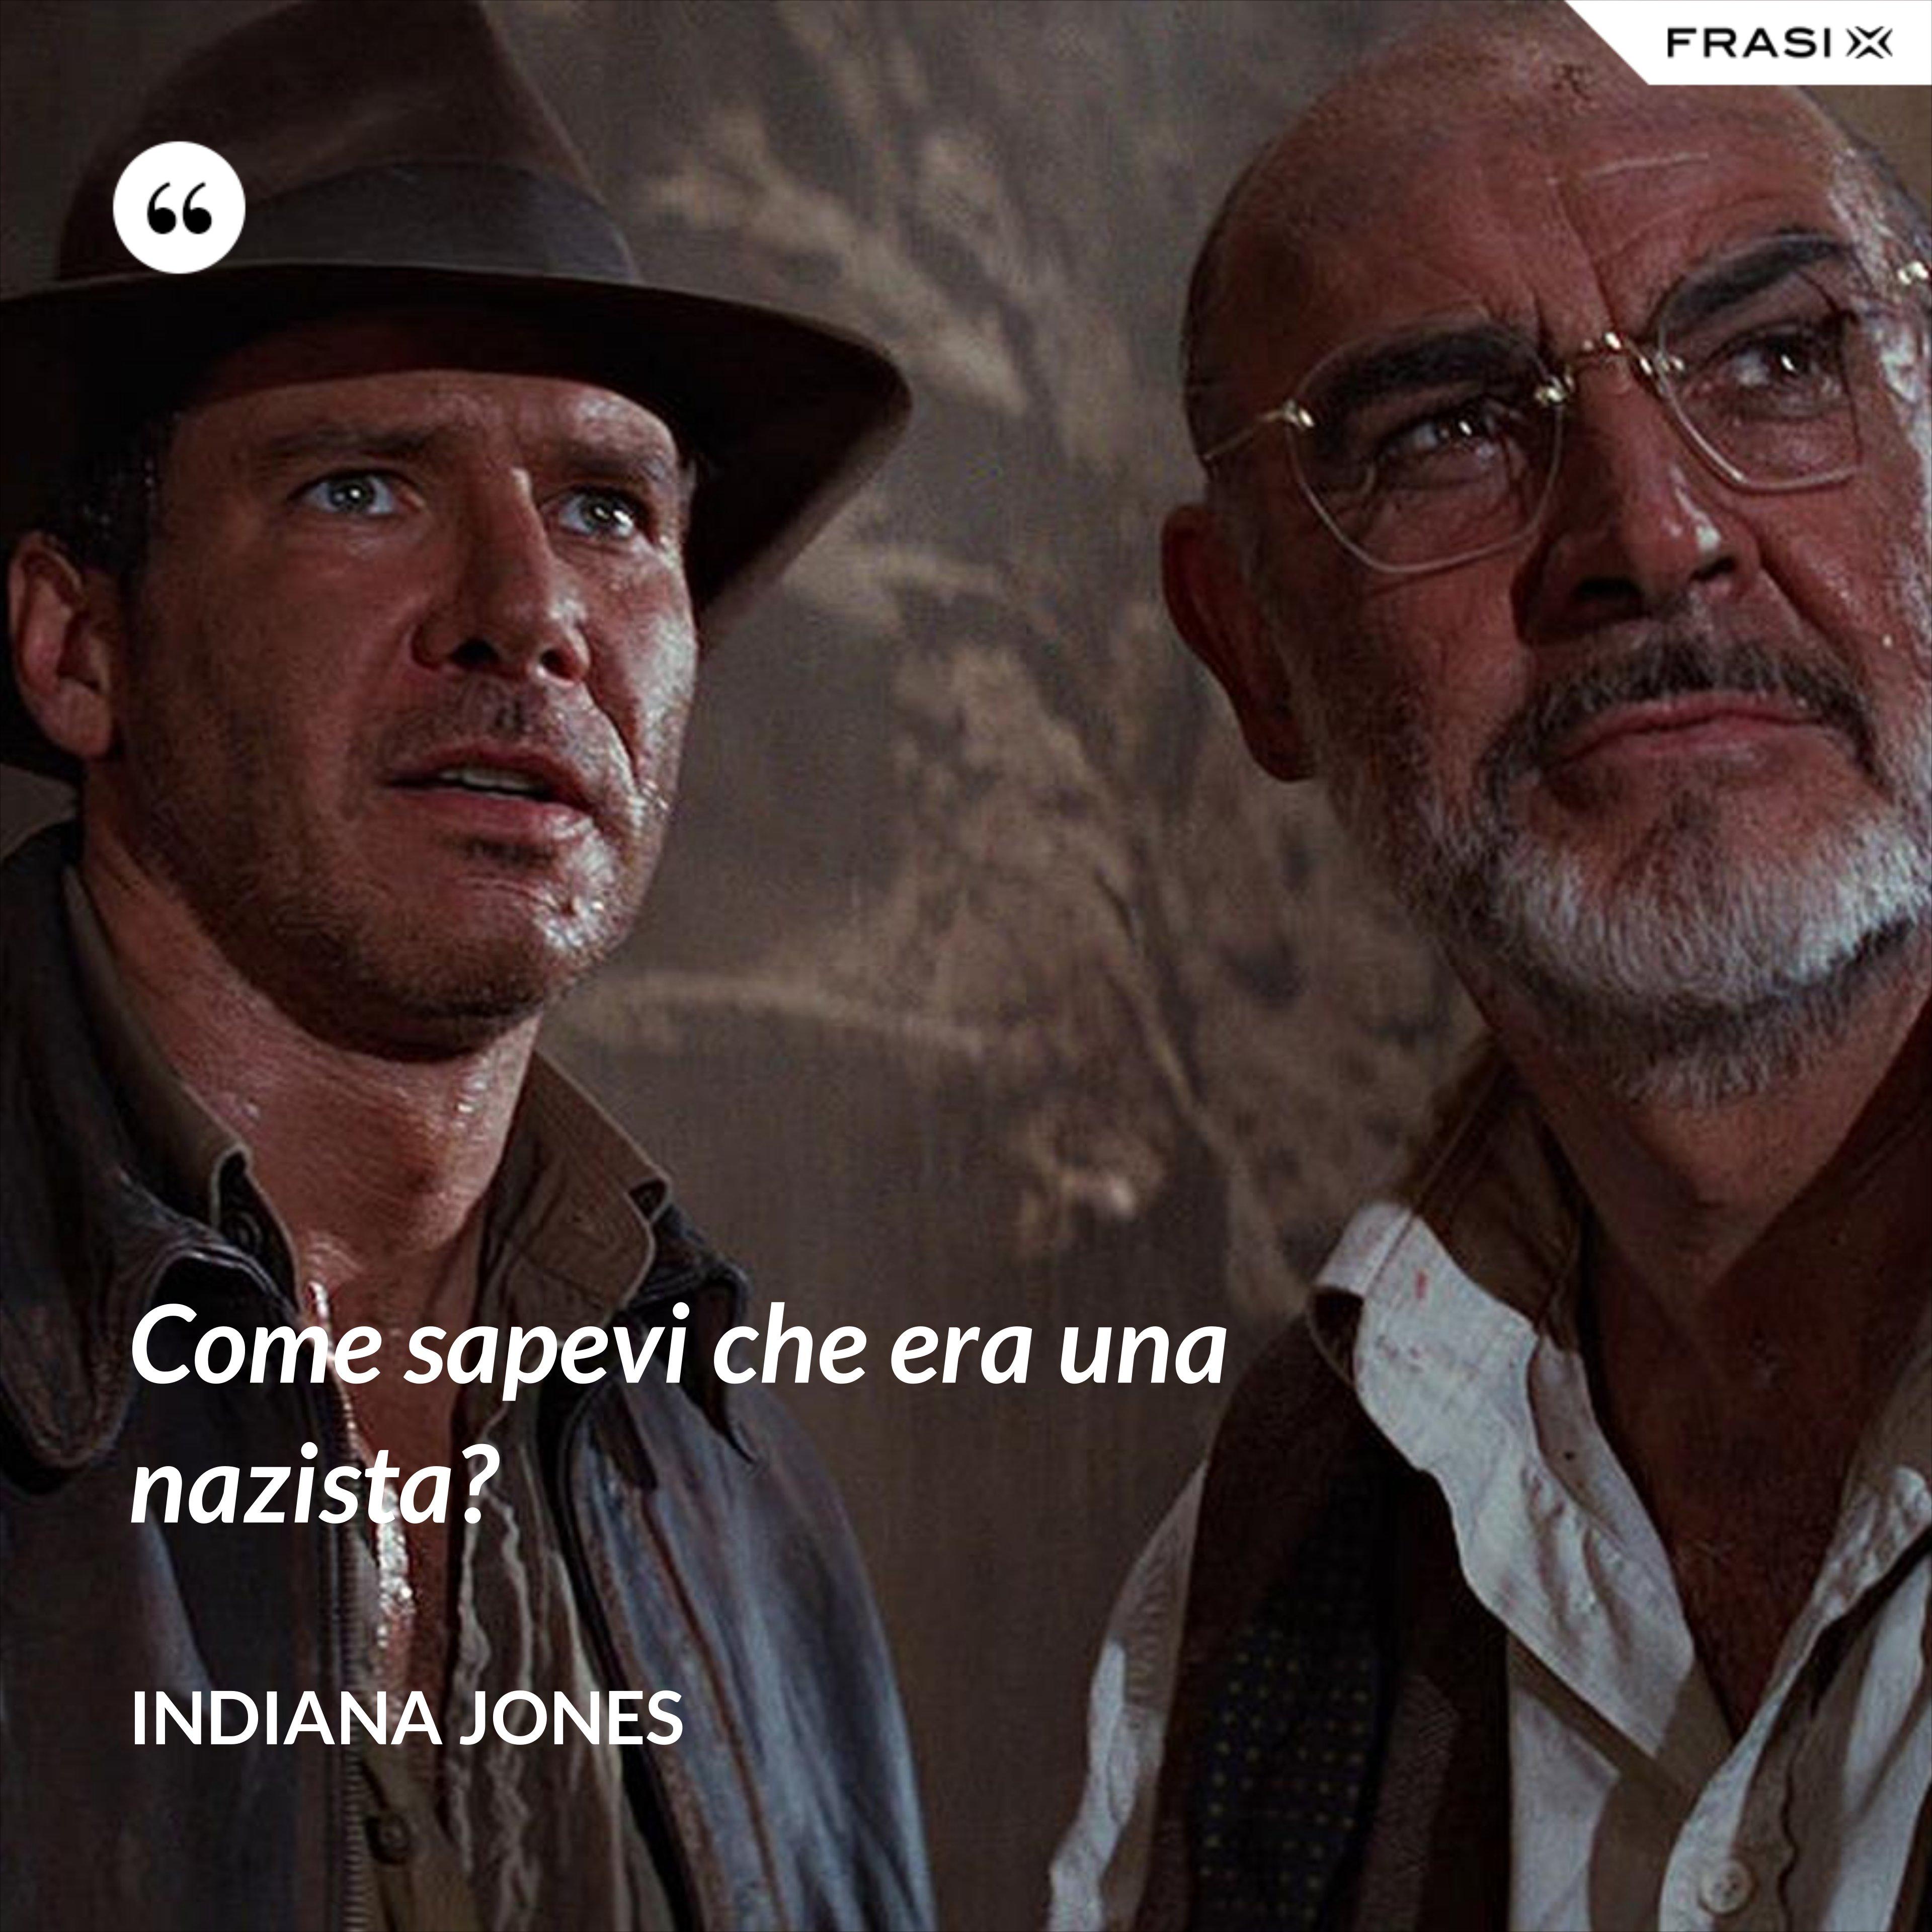 Come sapevi che era una nazista? - Indiana Jones